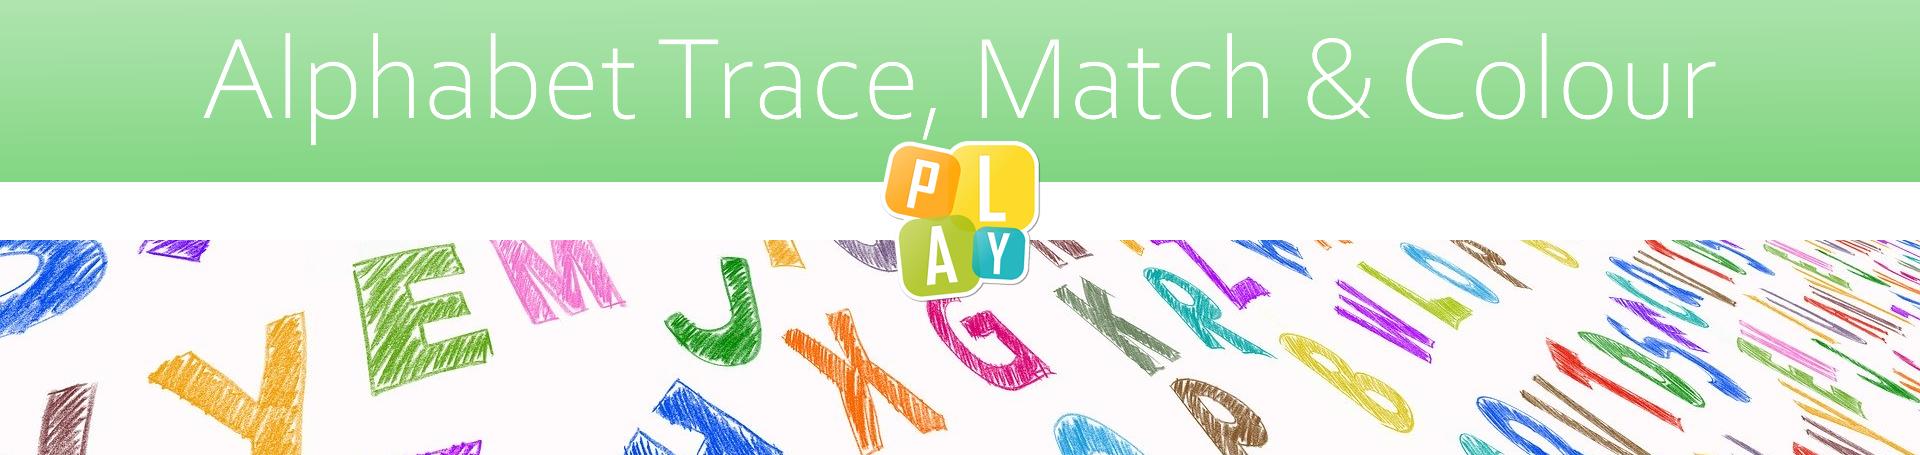 Header Alphabet Trace Match and Colour